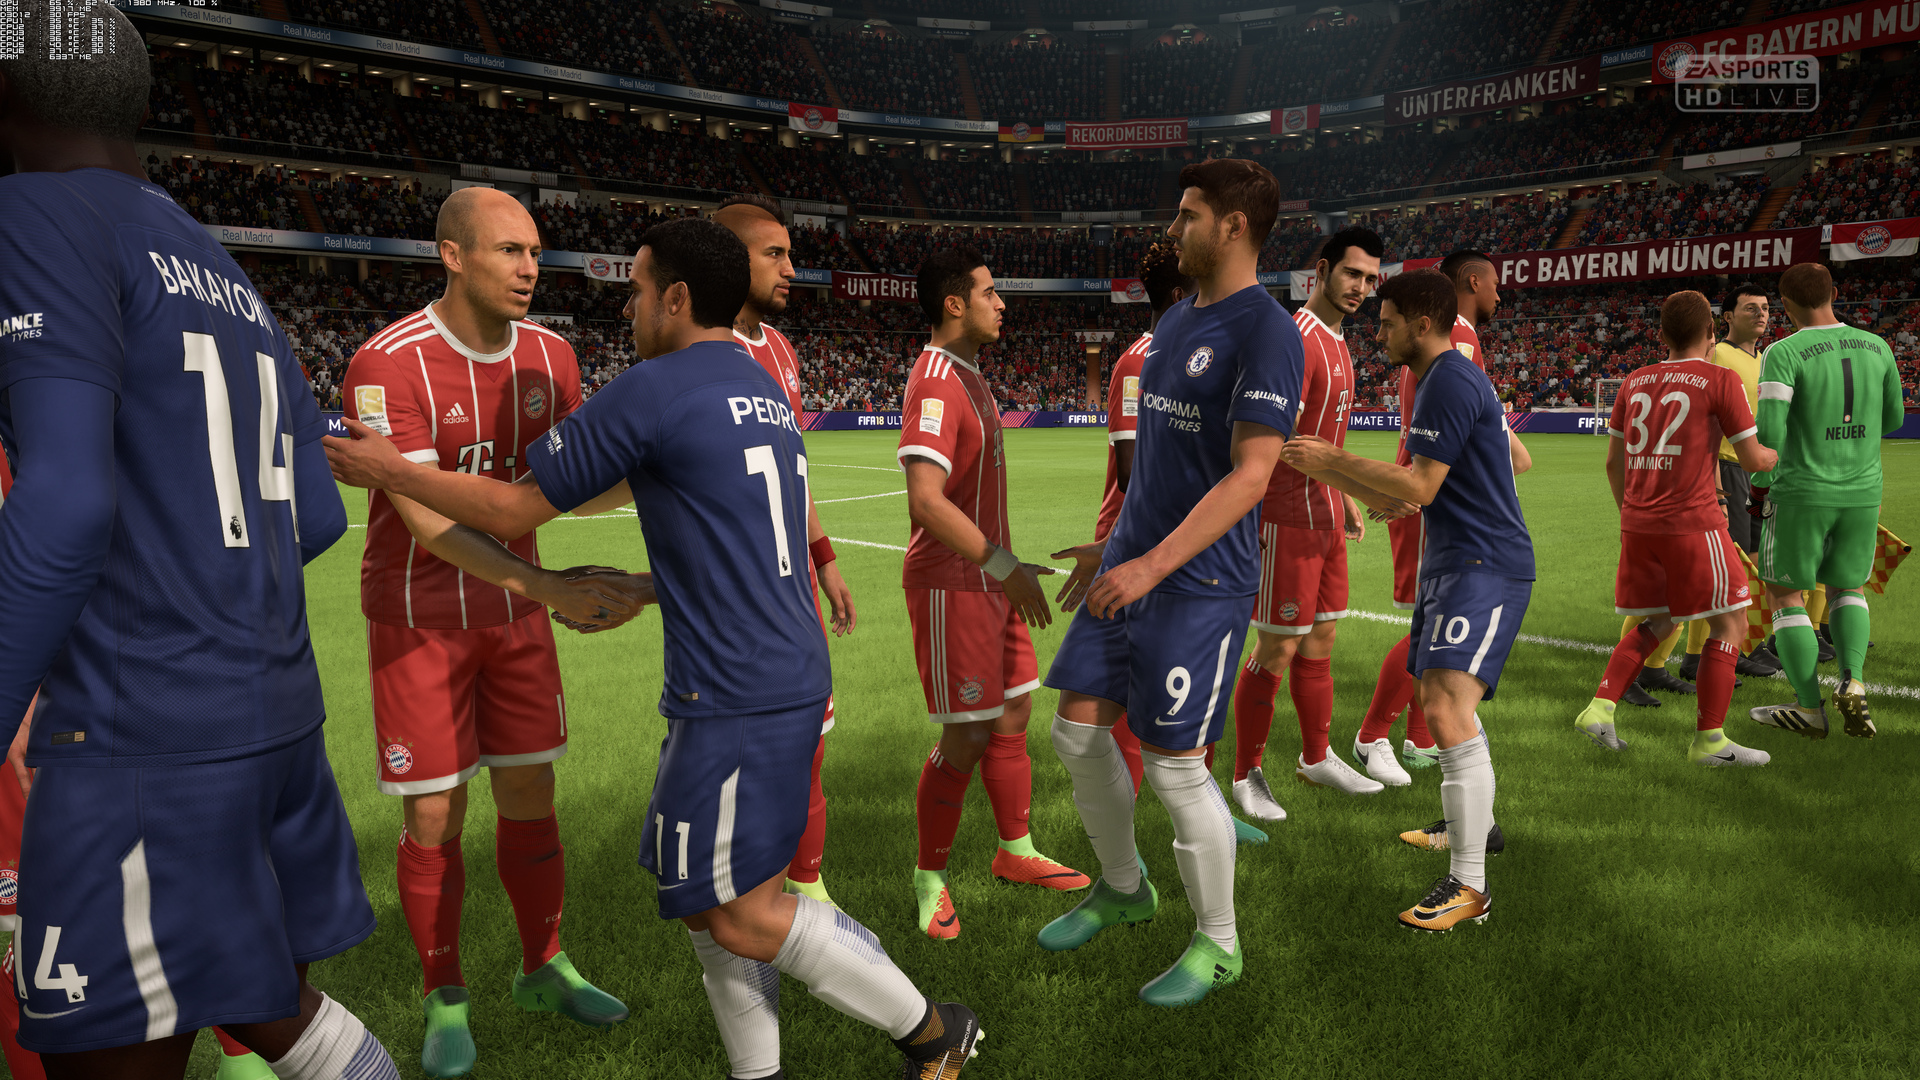 FIFA 18 - First Impressions + Full Match + 4K Screenshots - DSOGaming